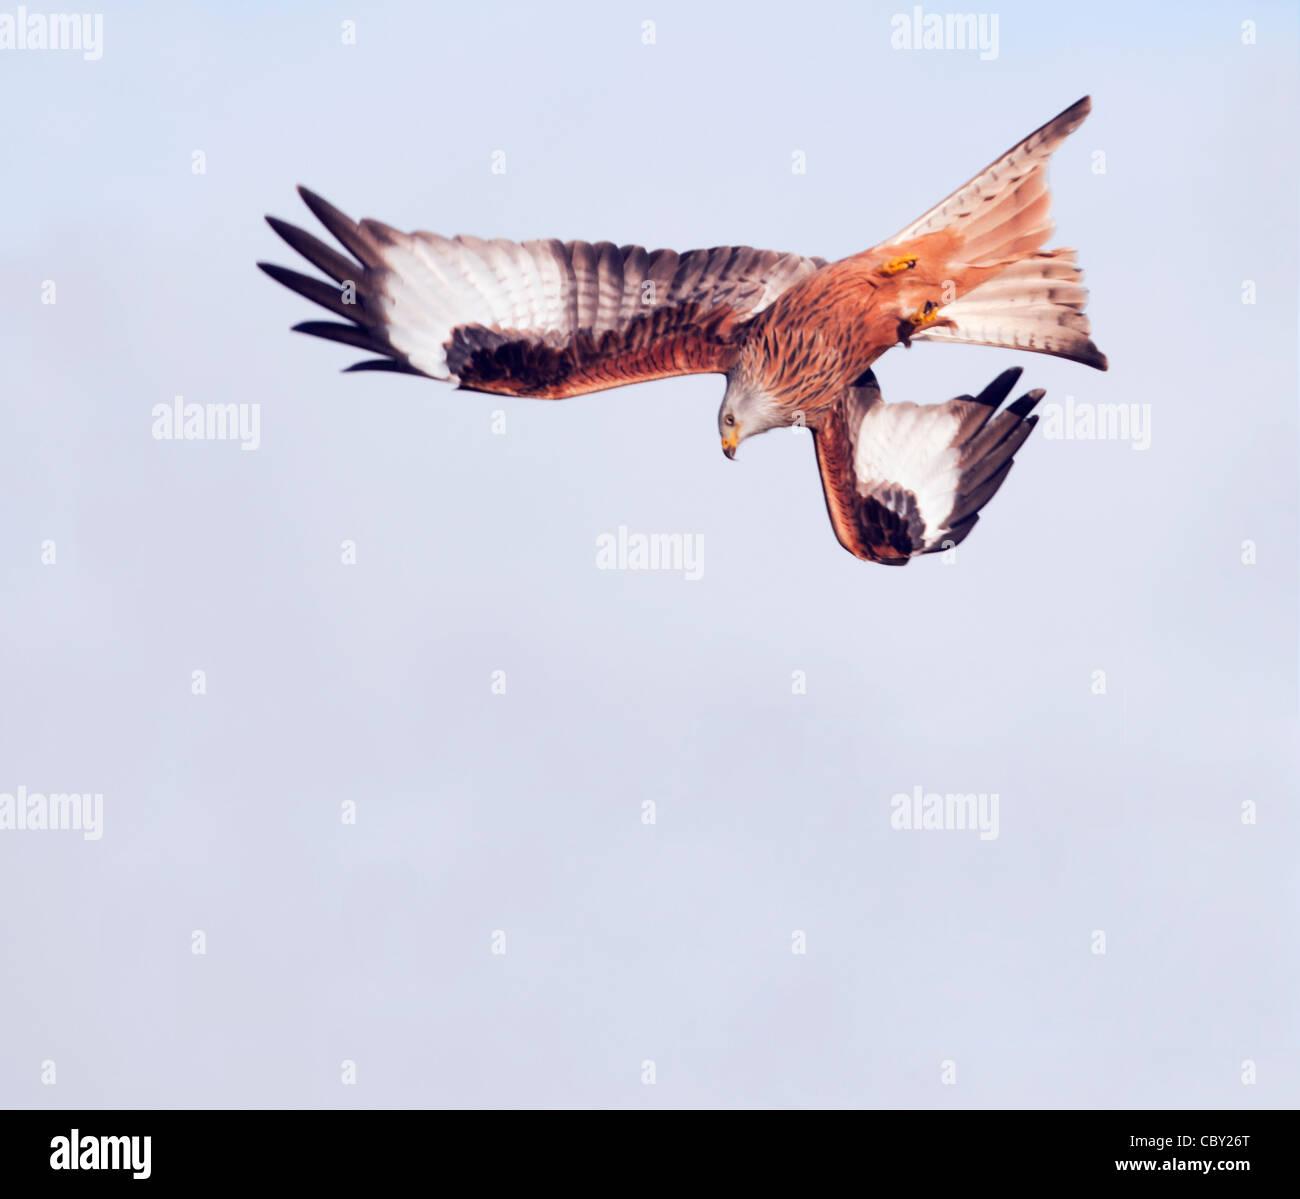 Red Kite Milvus milvus diving - Stock Image